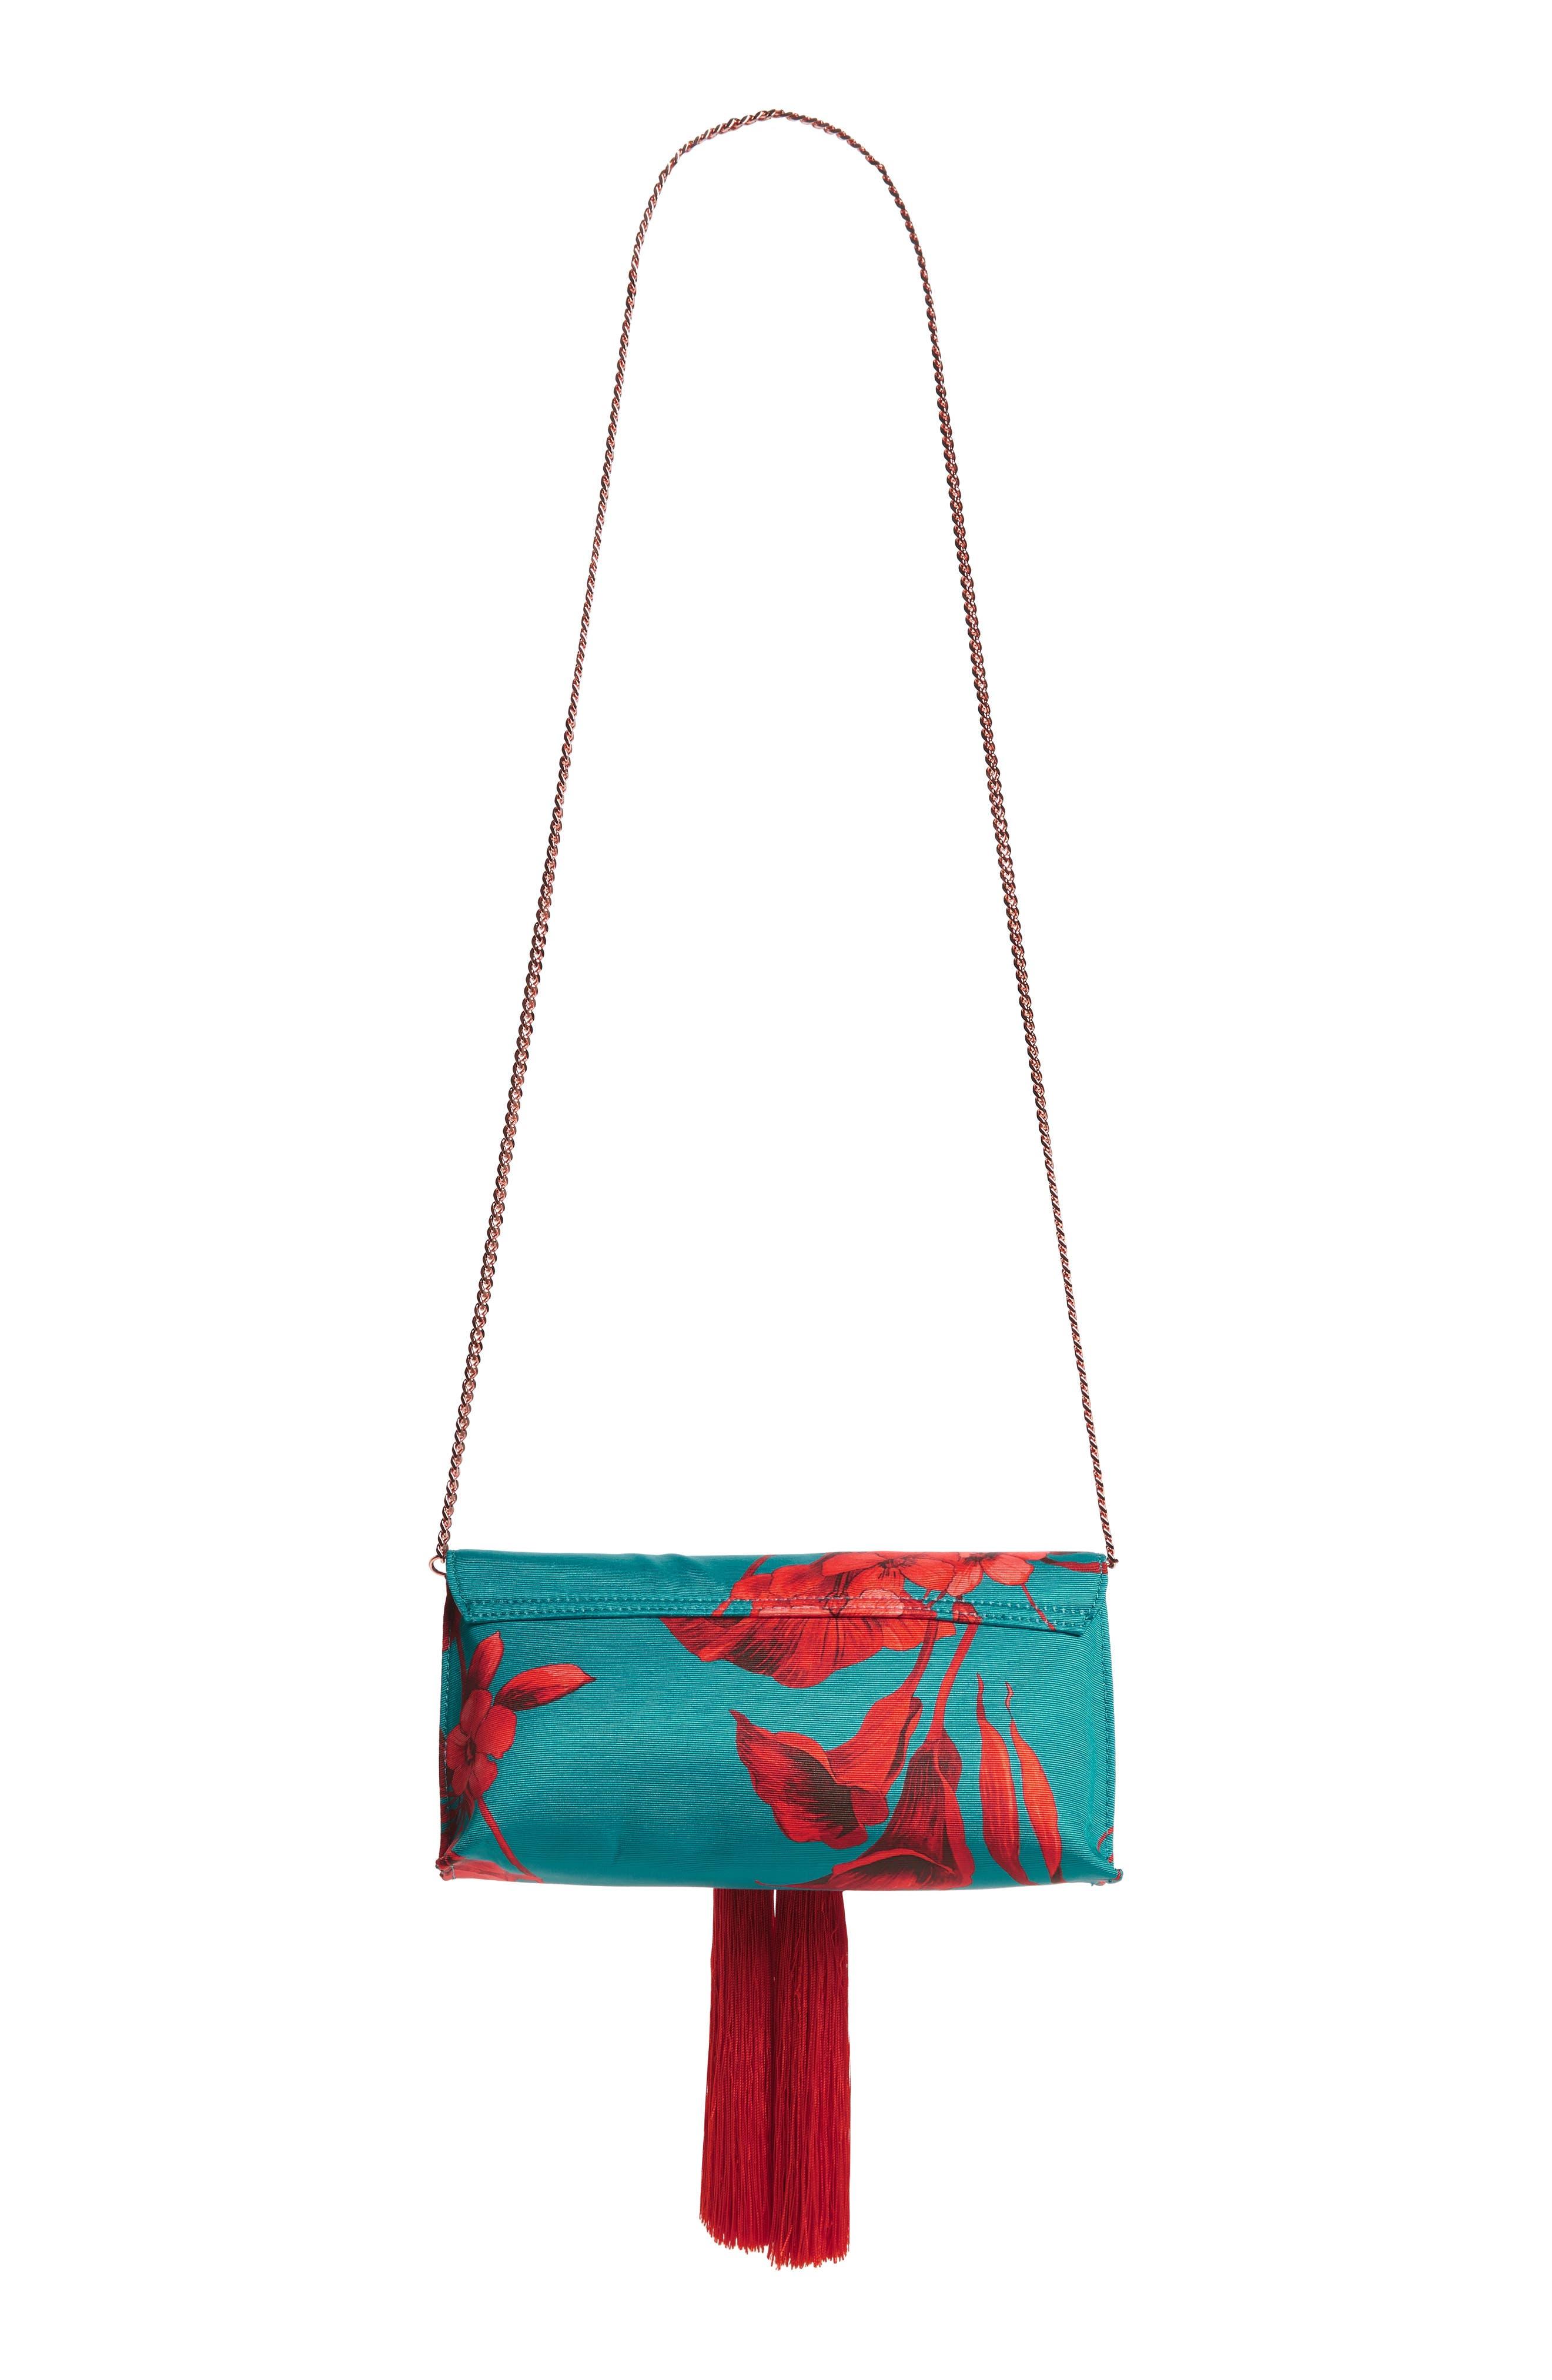 Darlee Fantasia Tassel Bag,                             Alternate thumbnail 4, color,                             TURQUOISE